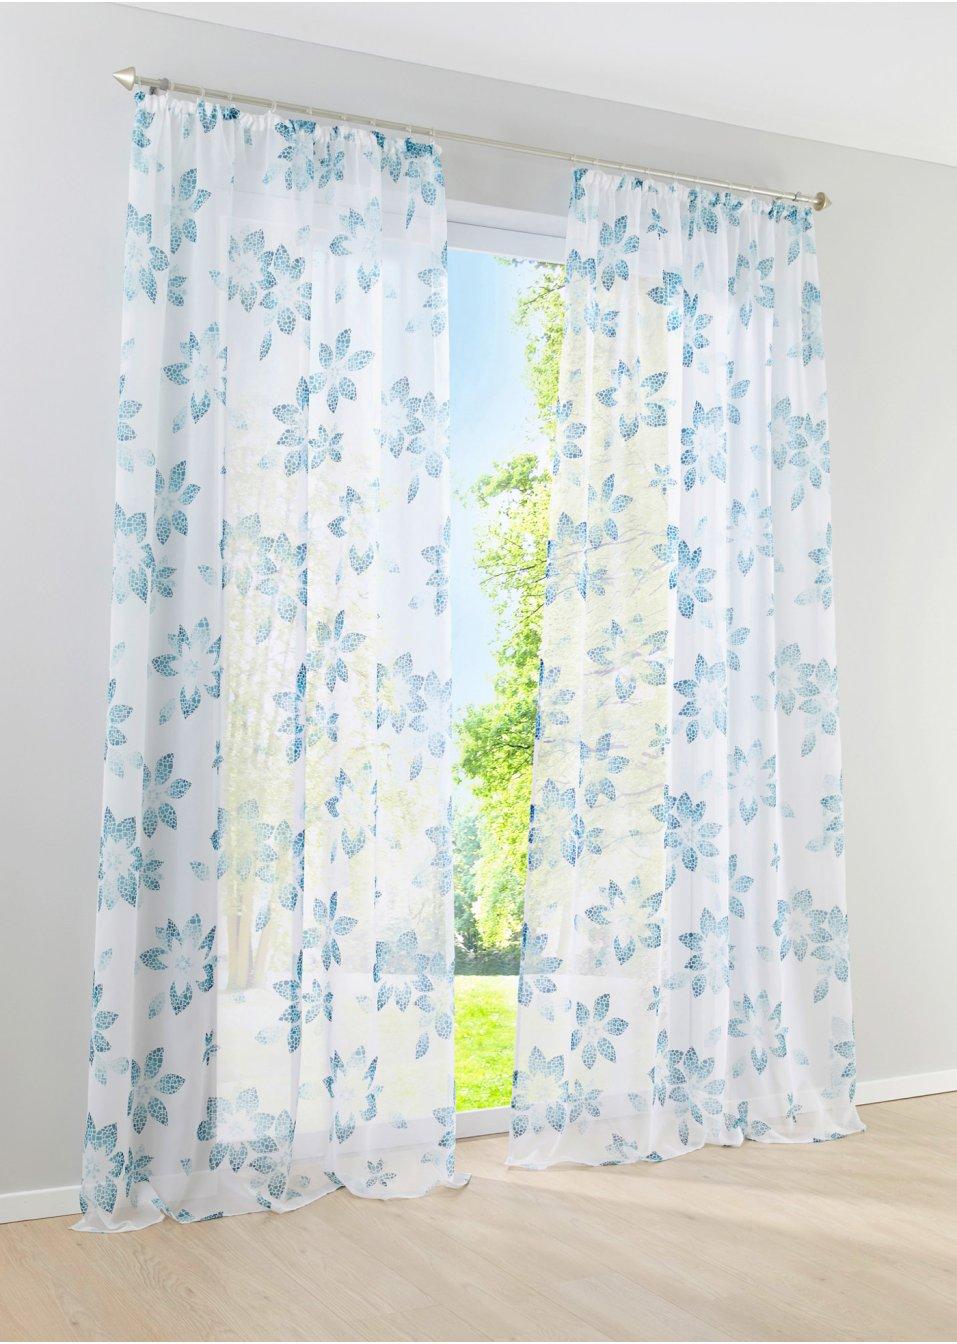 voilage maria 1 pce galon fronceur bleu ciel bpc living commande online. Black Bedroom Furniture Sets. Home Design Ideas